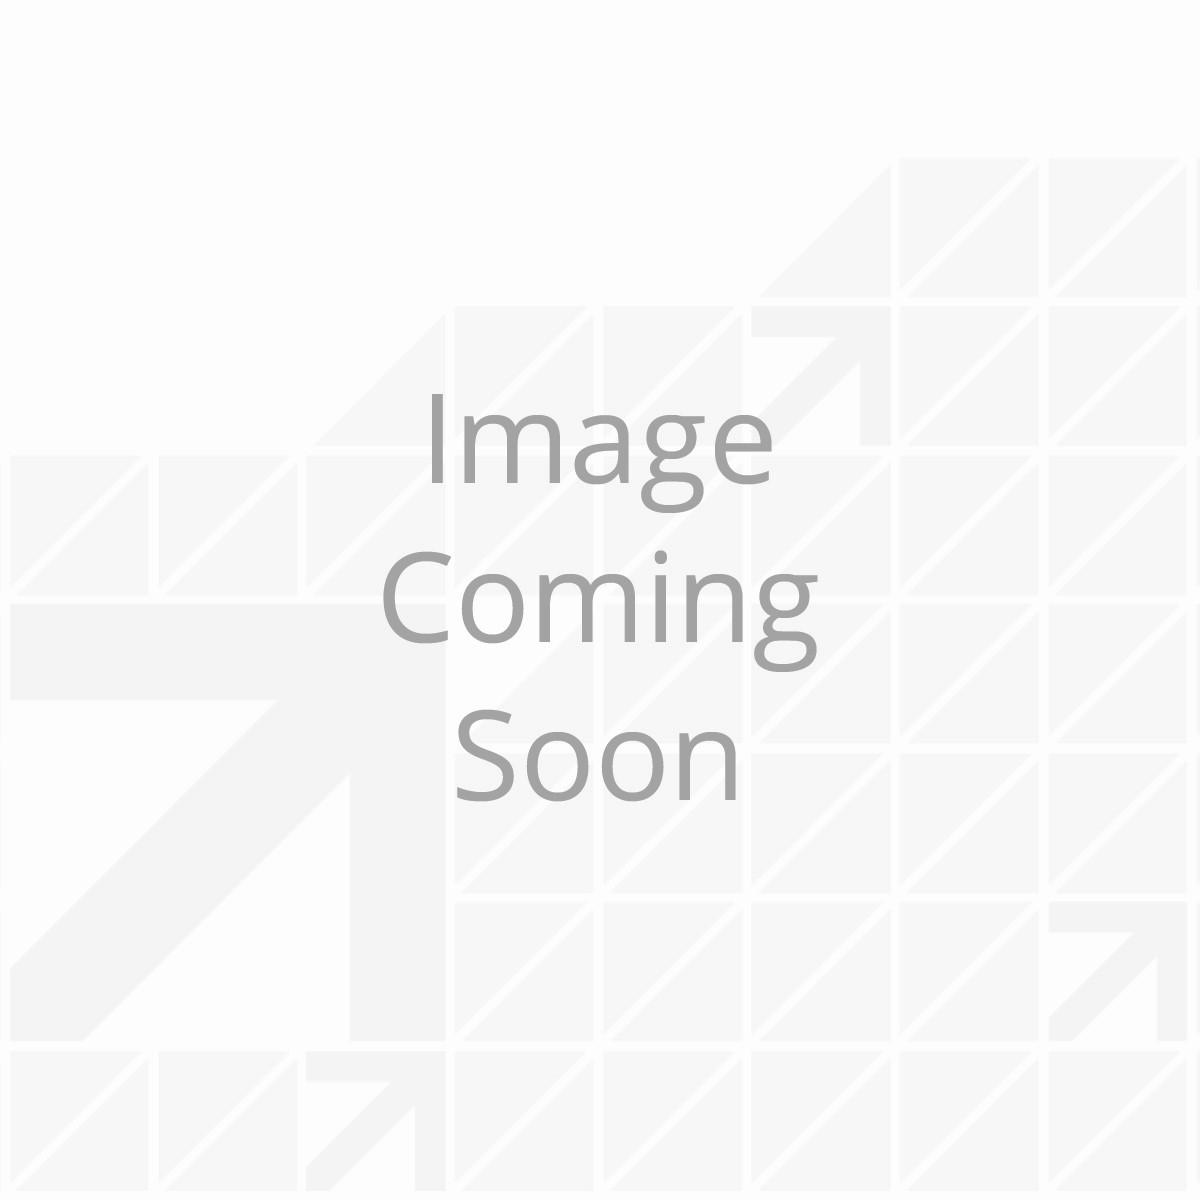 14' Power & Hybrid Awning Roller Assembly - Prepflex Sand Fade